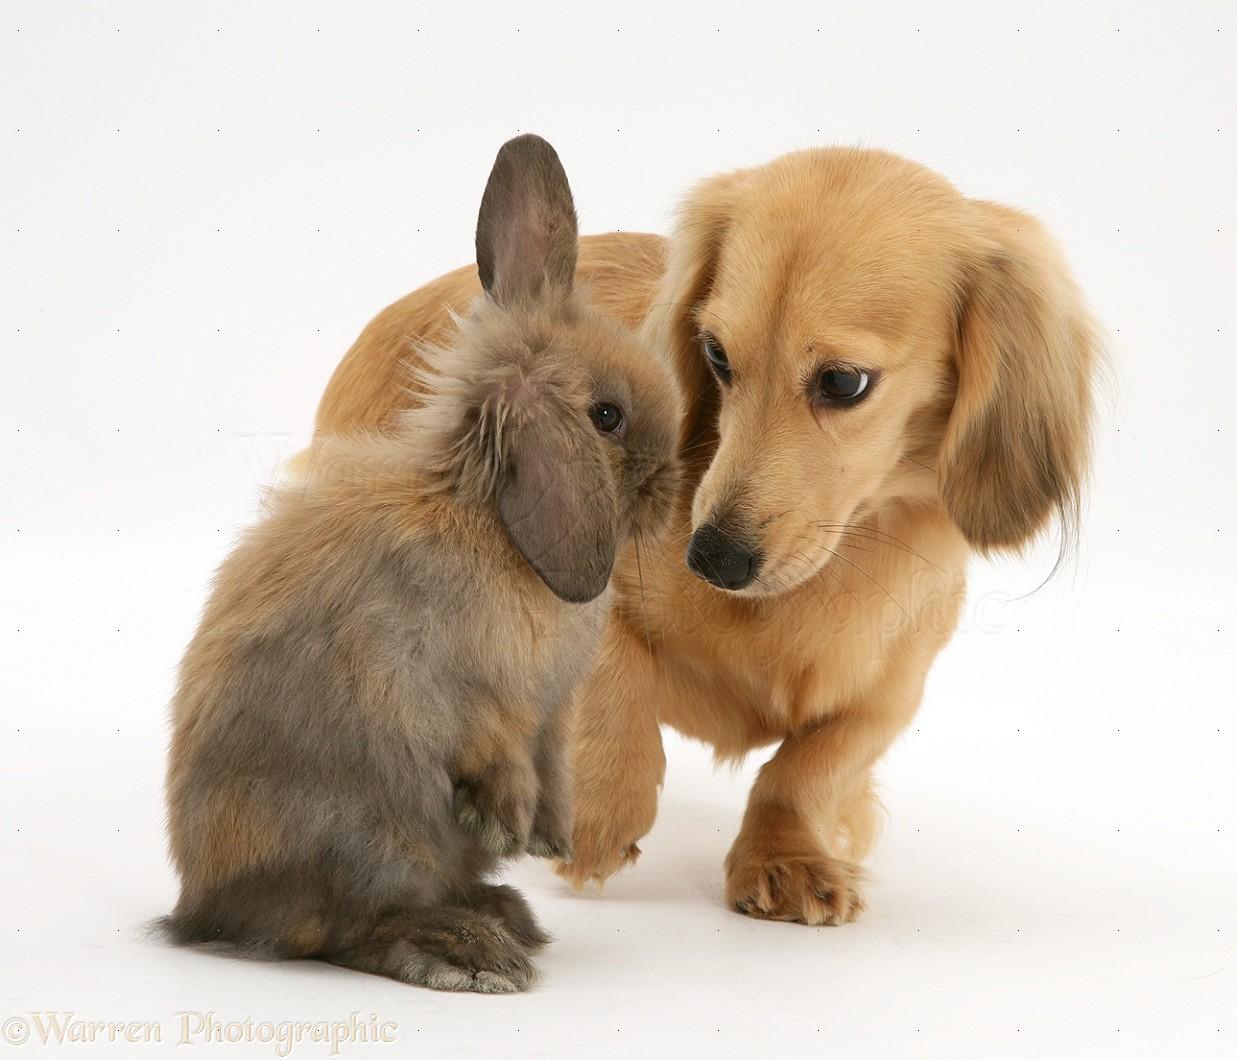 Pets Lop Rabbit Meets Cream Dapple Dachshund Pup Photo